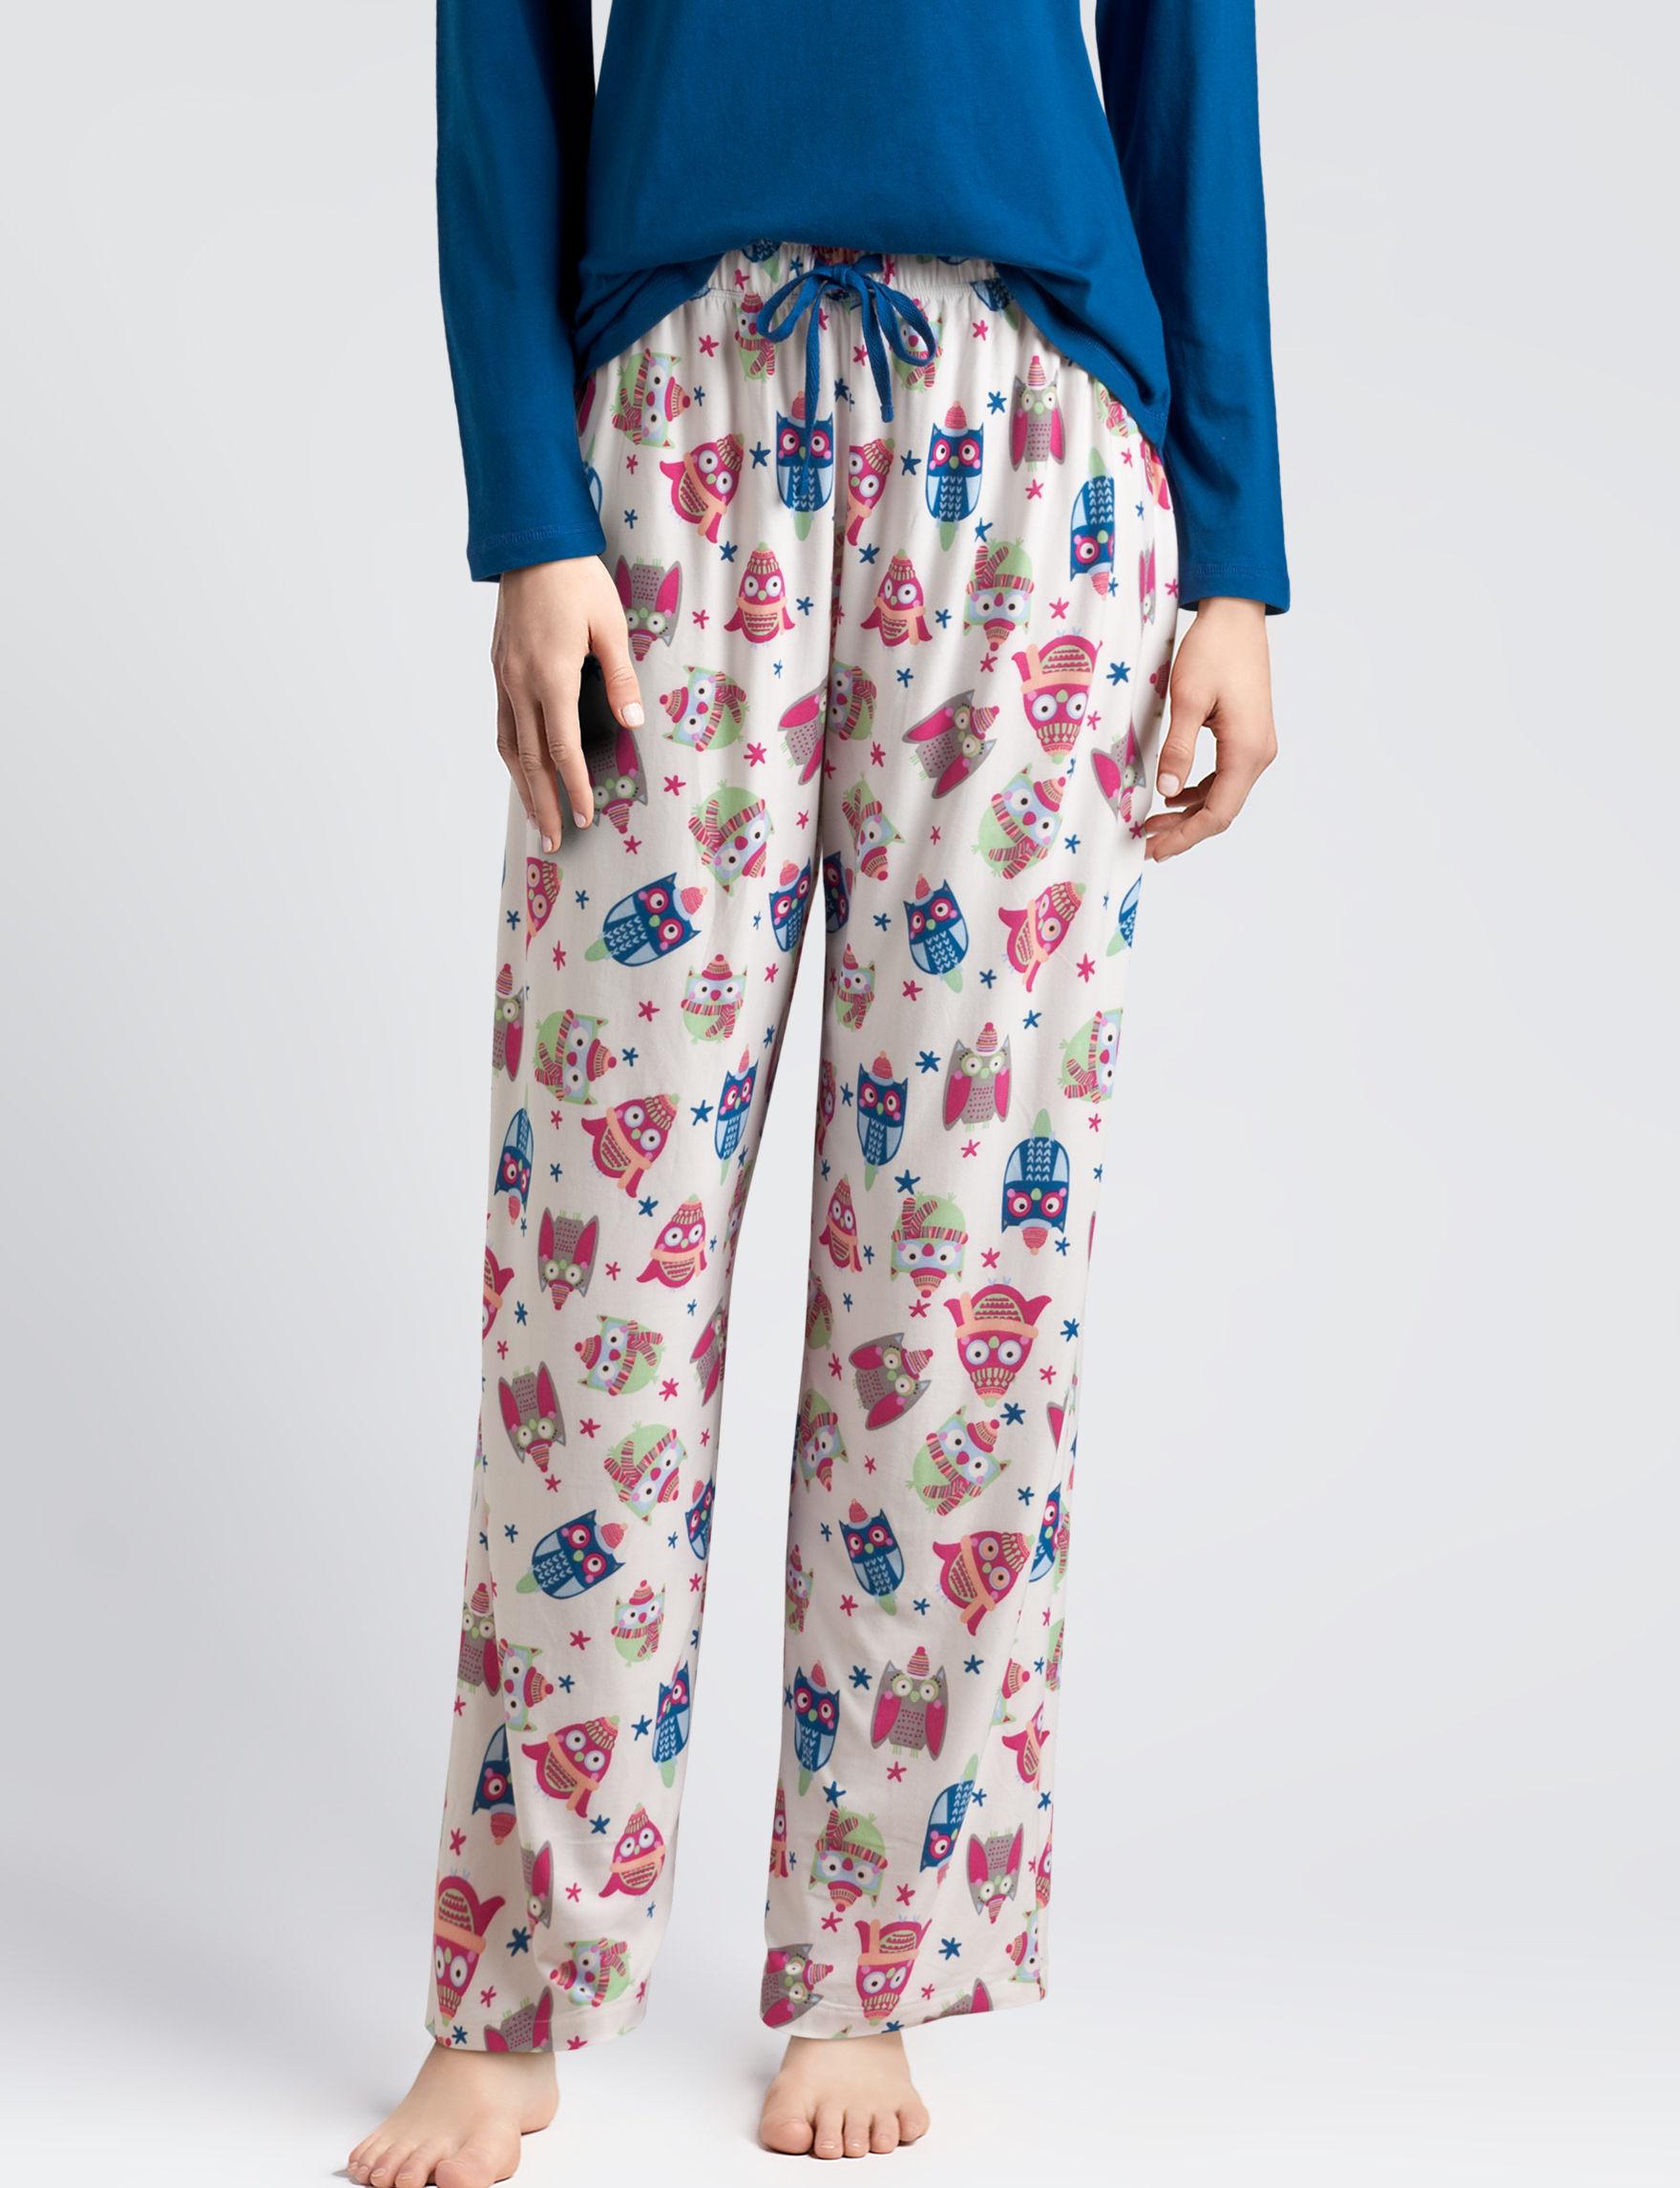 Goodnight Kiss White / Blue Pajama Bottoms